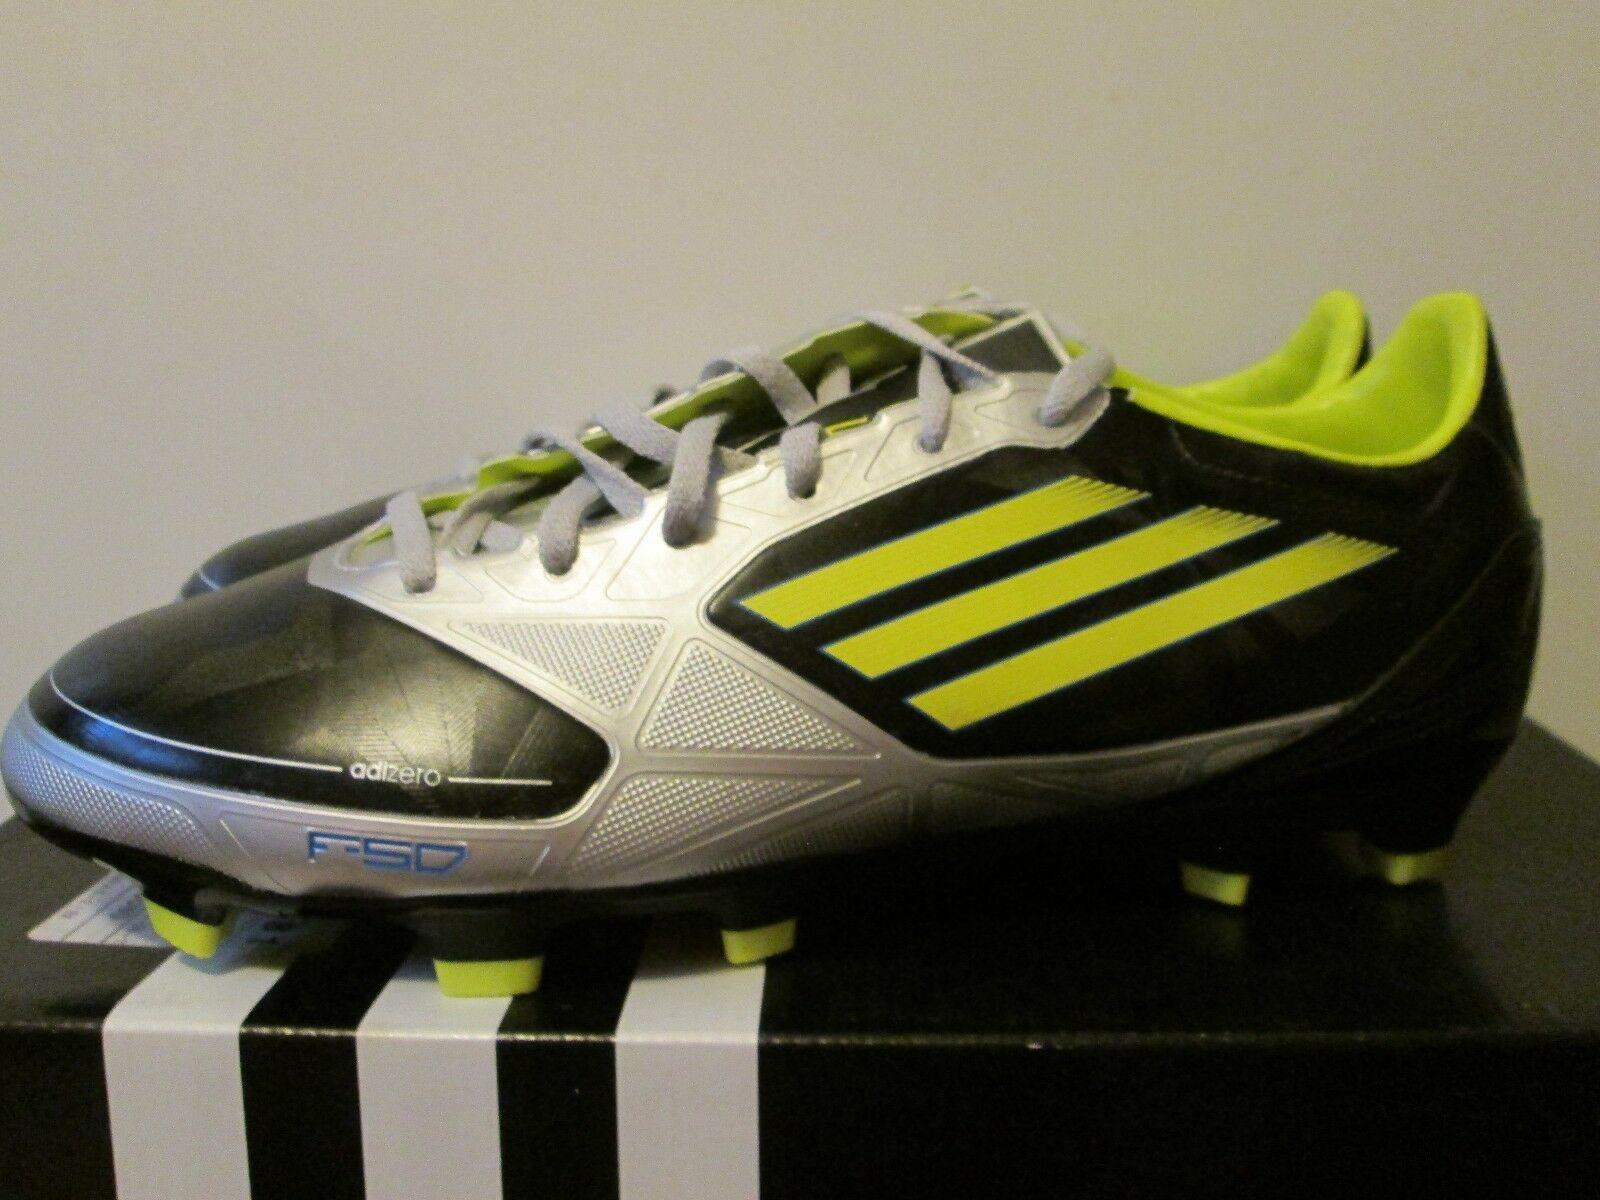 Adidas Adizero F30 TRX FG Black Lime/Silver Lightweight Soccer Cleats 7.5 NEW